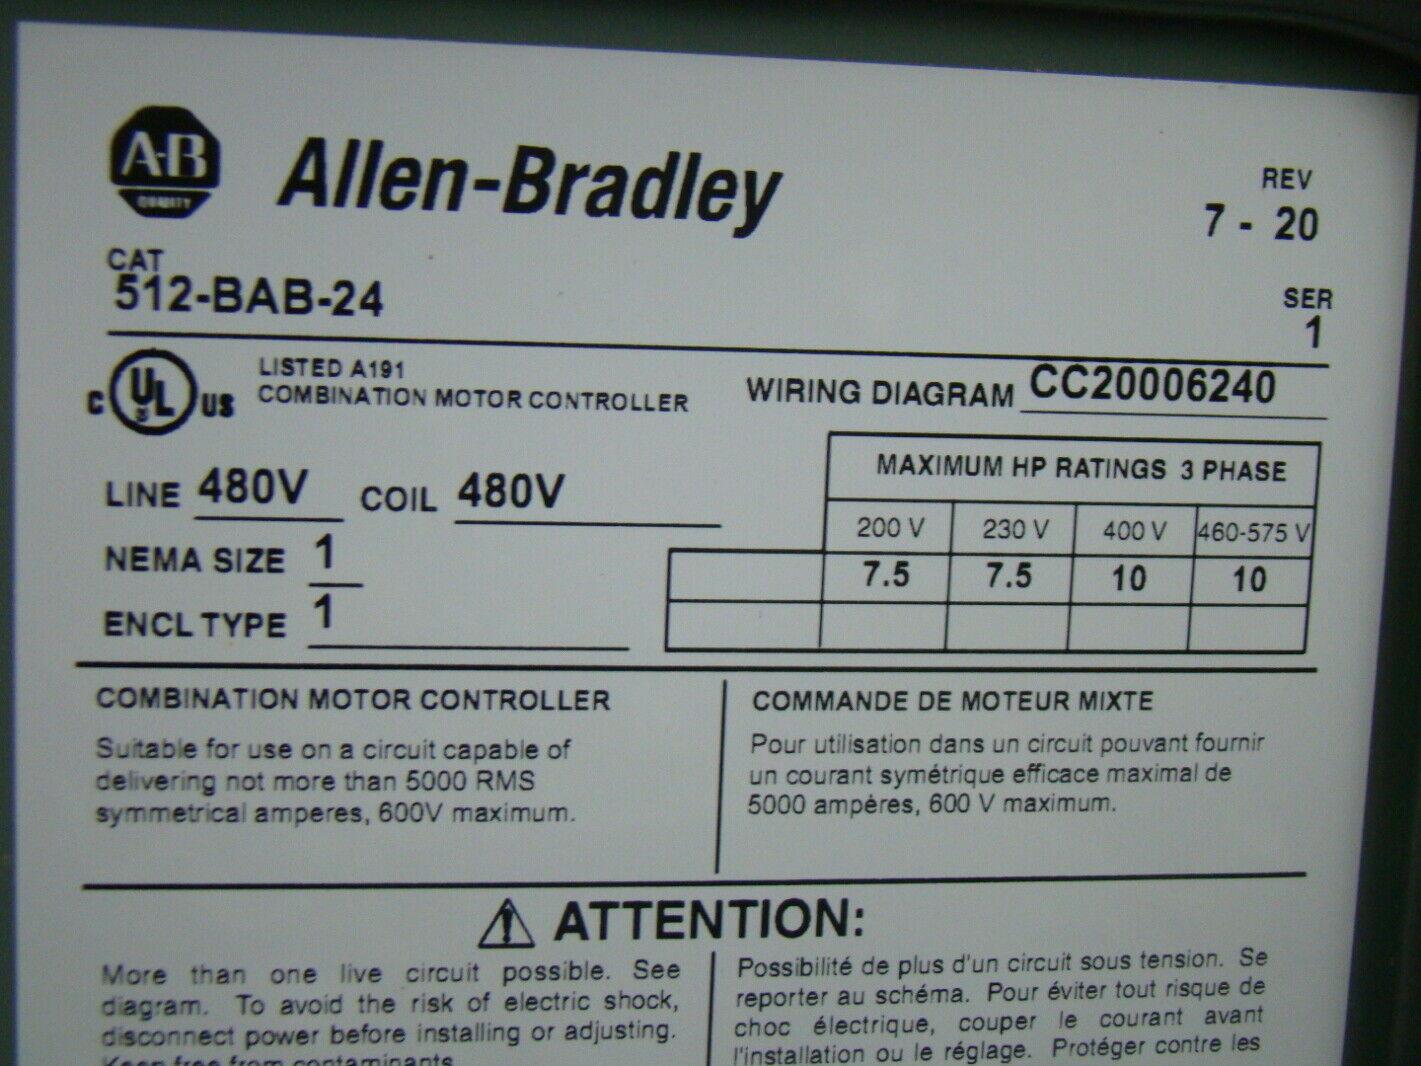 Allen Bradley 512 Combination Starter Wiring Diagram Modern Design 3 Phase For 120v 480v Size 1 Motor Bab 24 Rh Fazziosurplus Com Mcc Diagrams Starters 609u